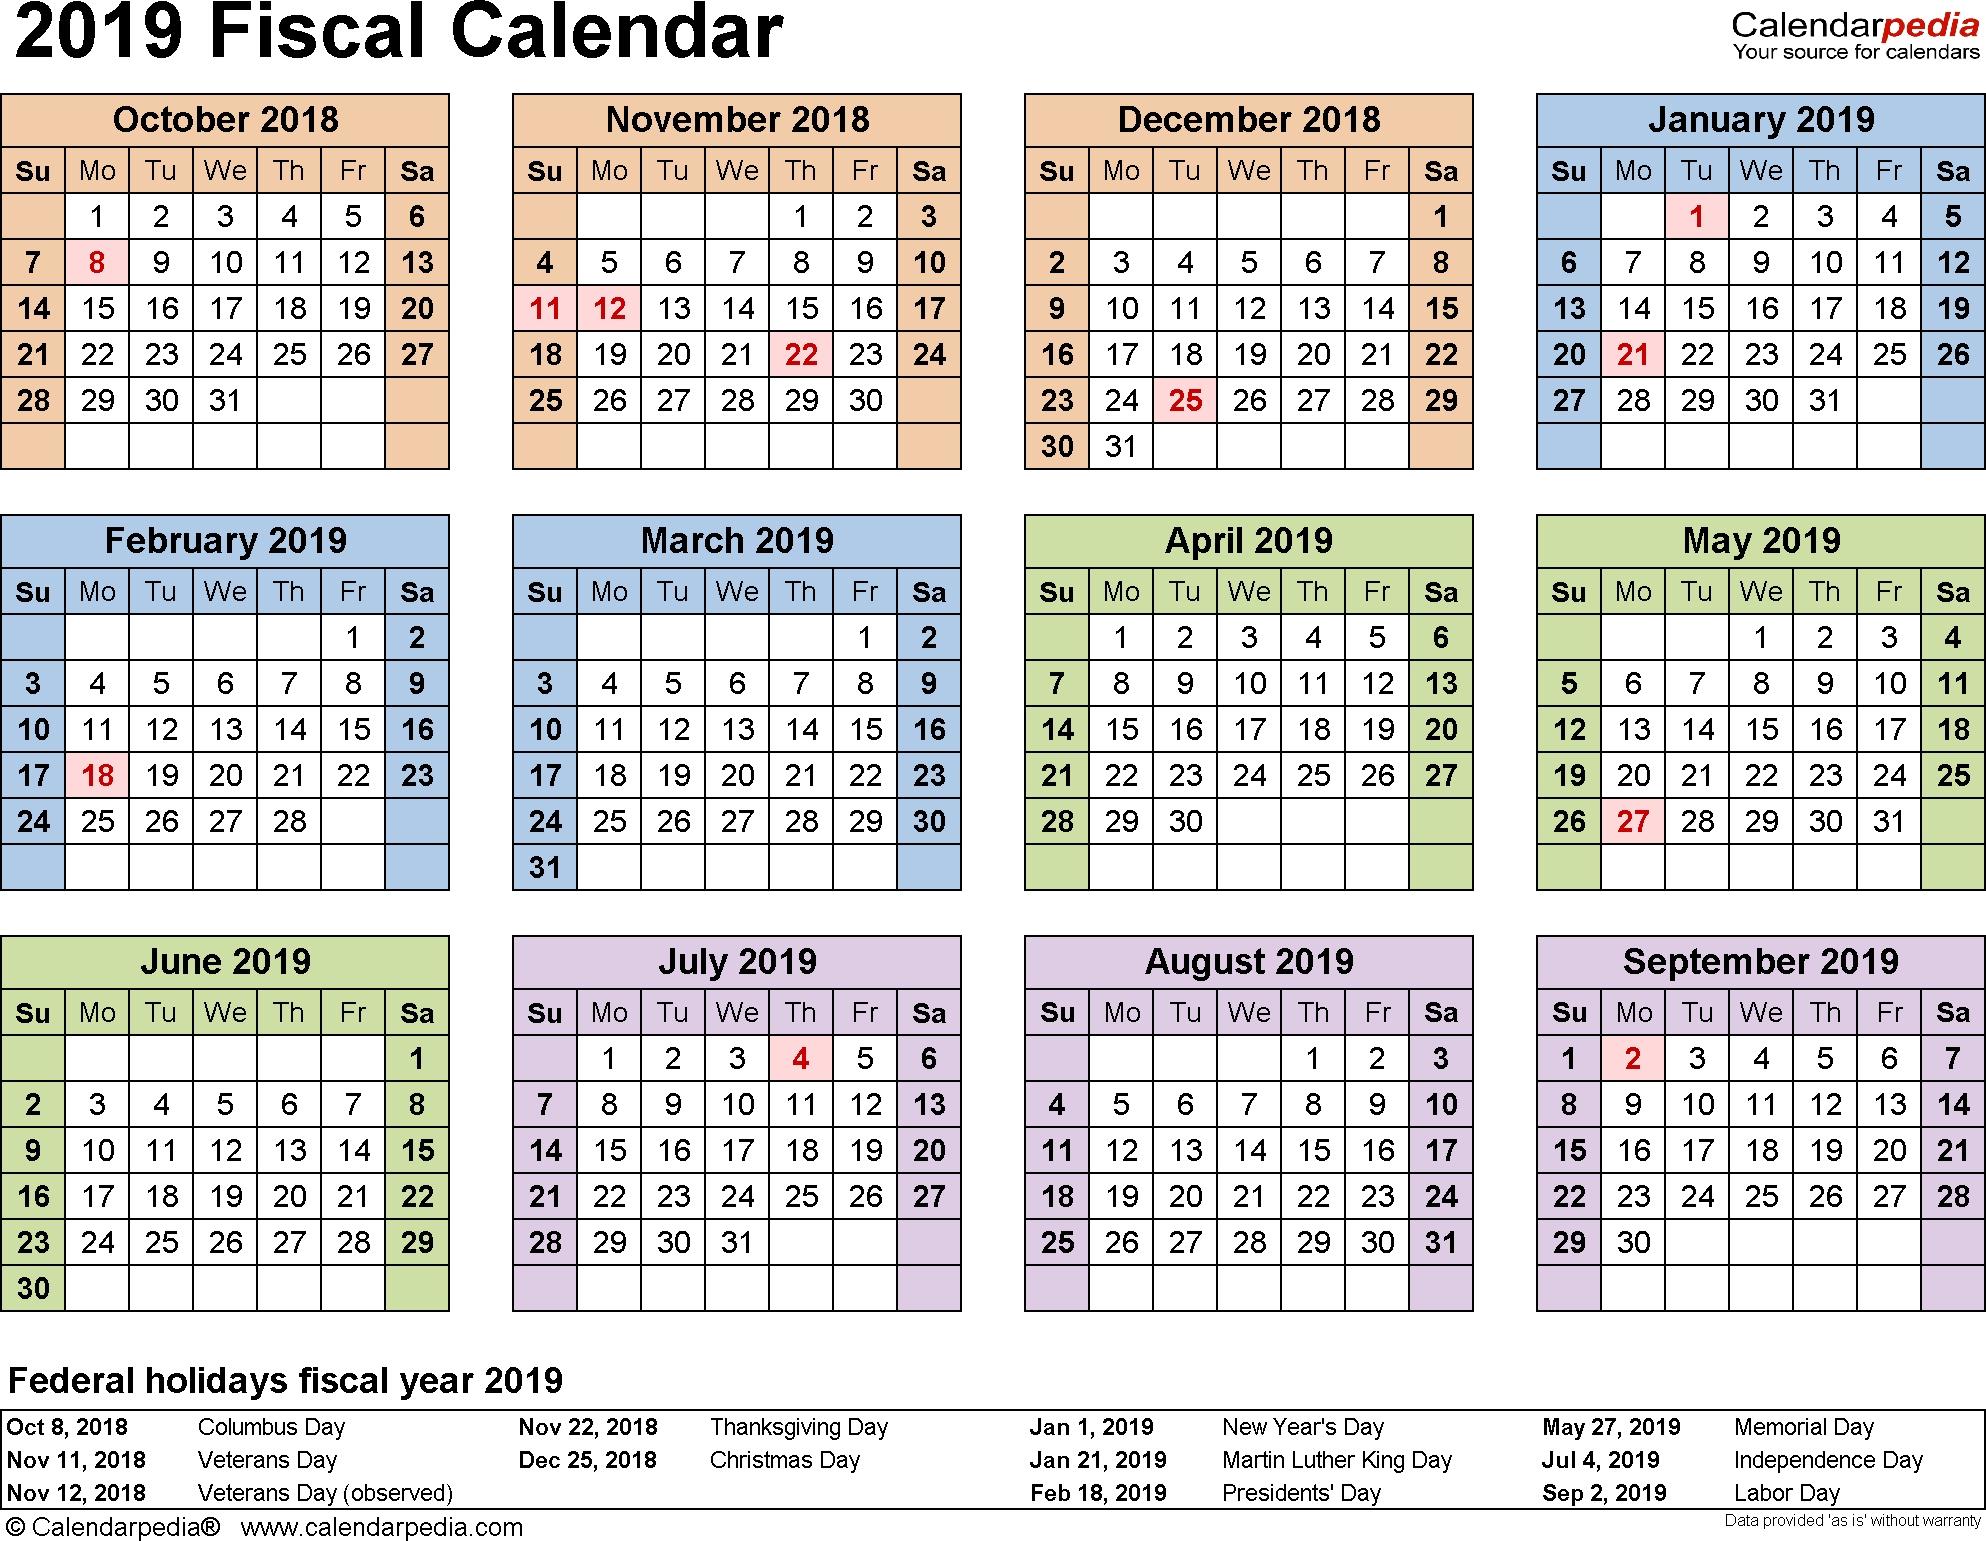 2019-2020 Calendar Financial Week Numbers - Calendar